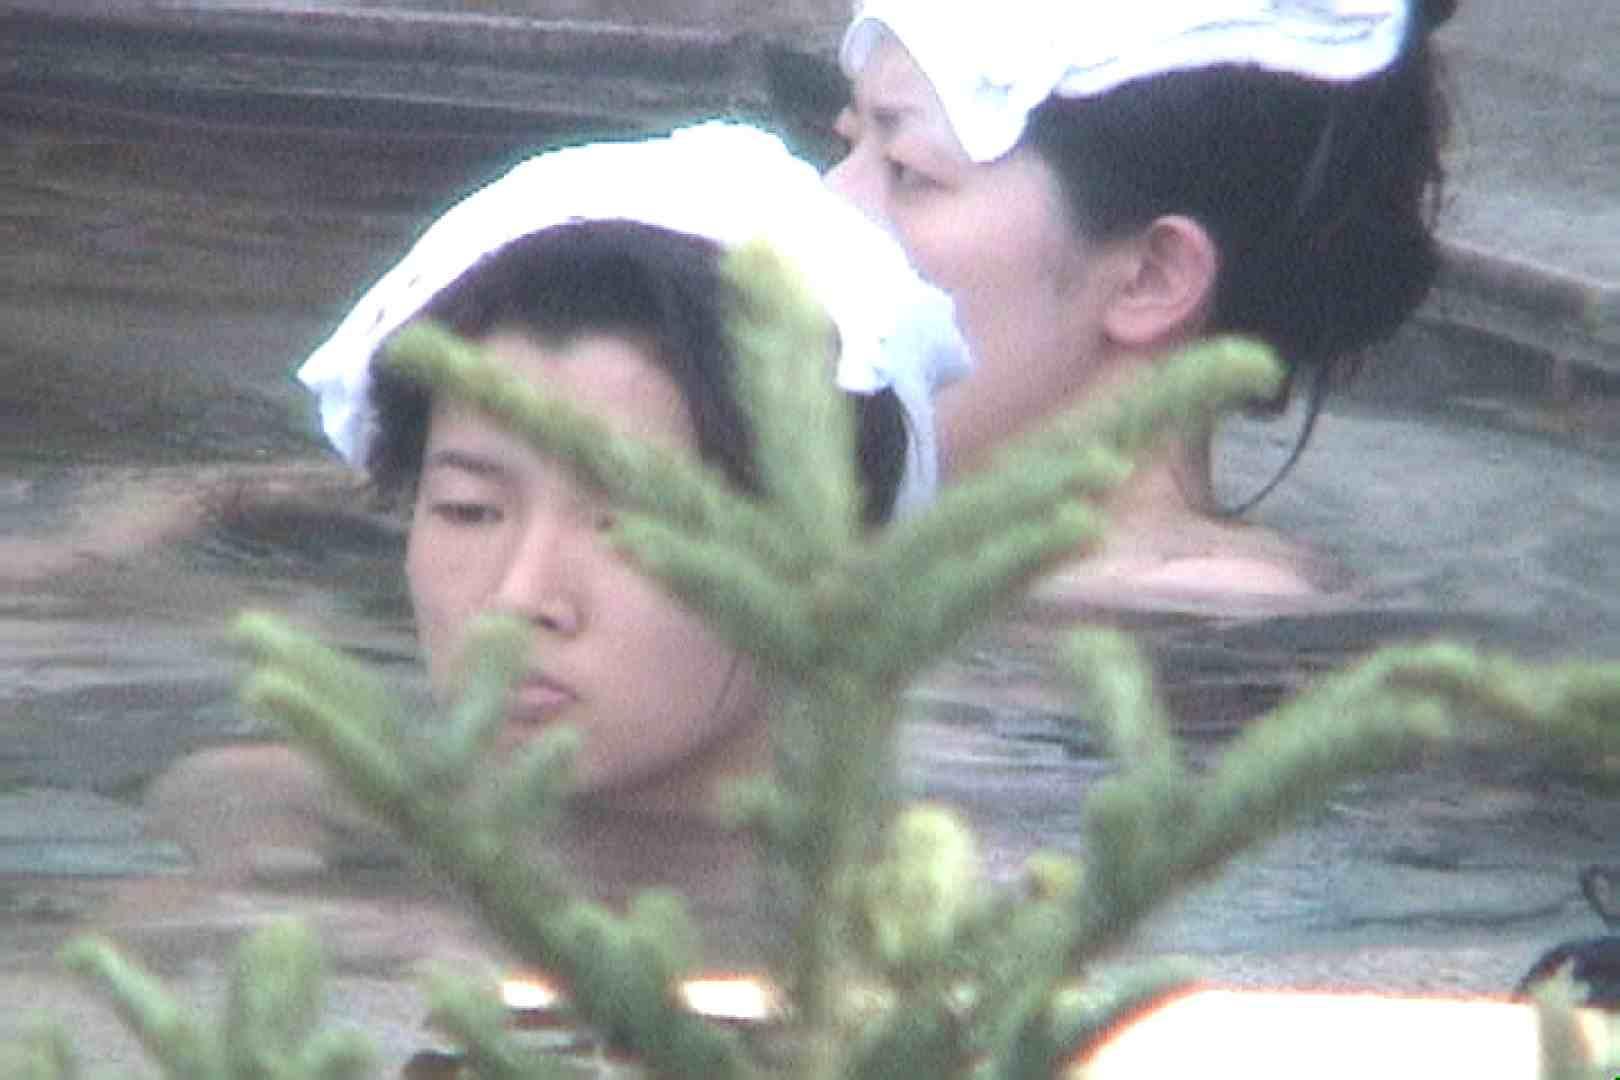 Aquaな露天風呂Vol.80【VIP限定】 盗撮 | HなOL  66pic 45